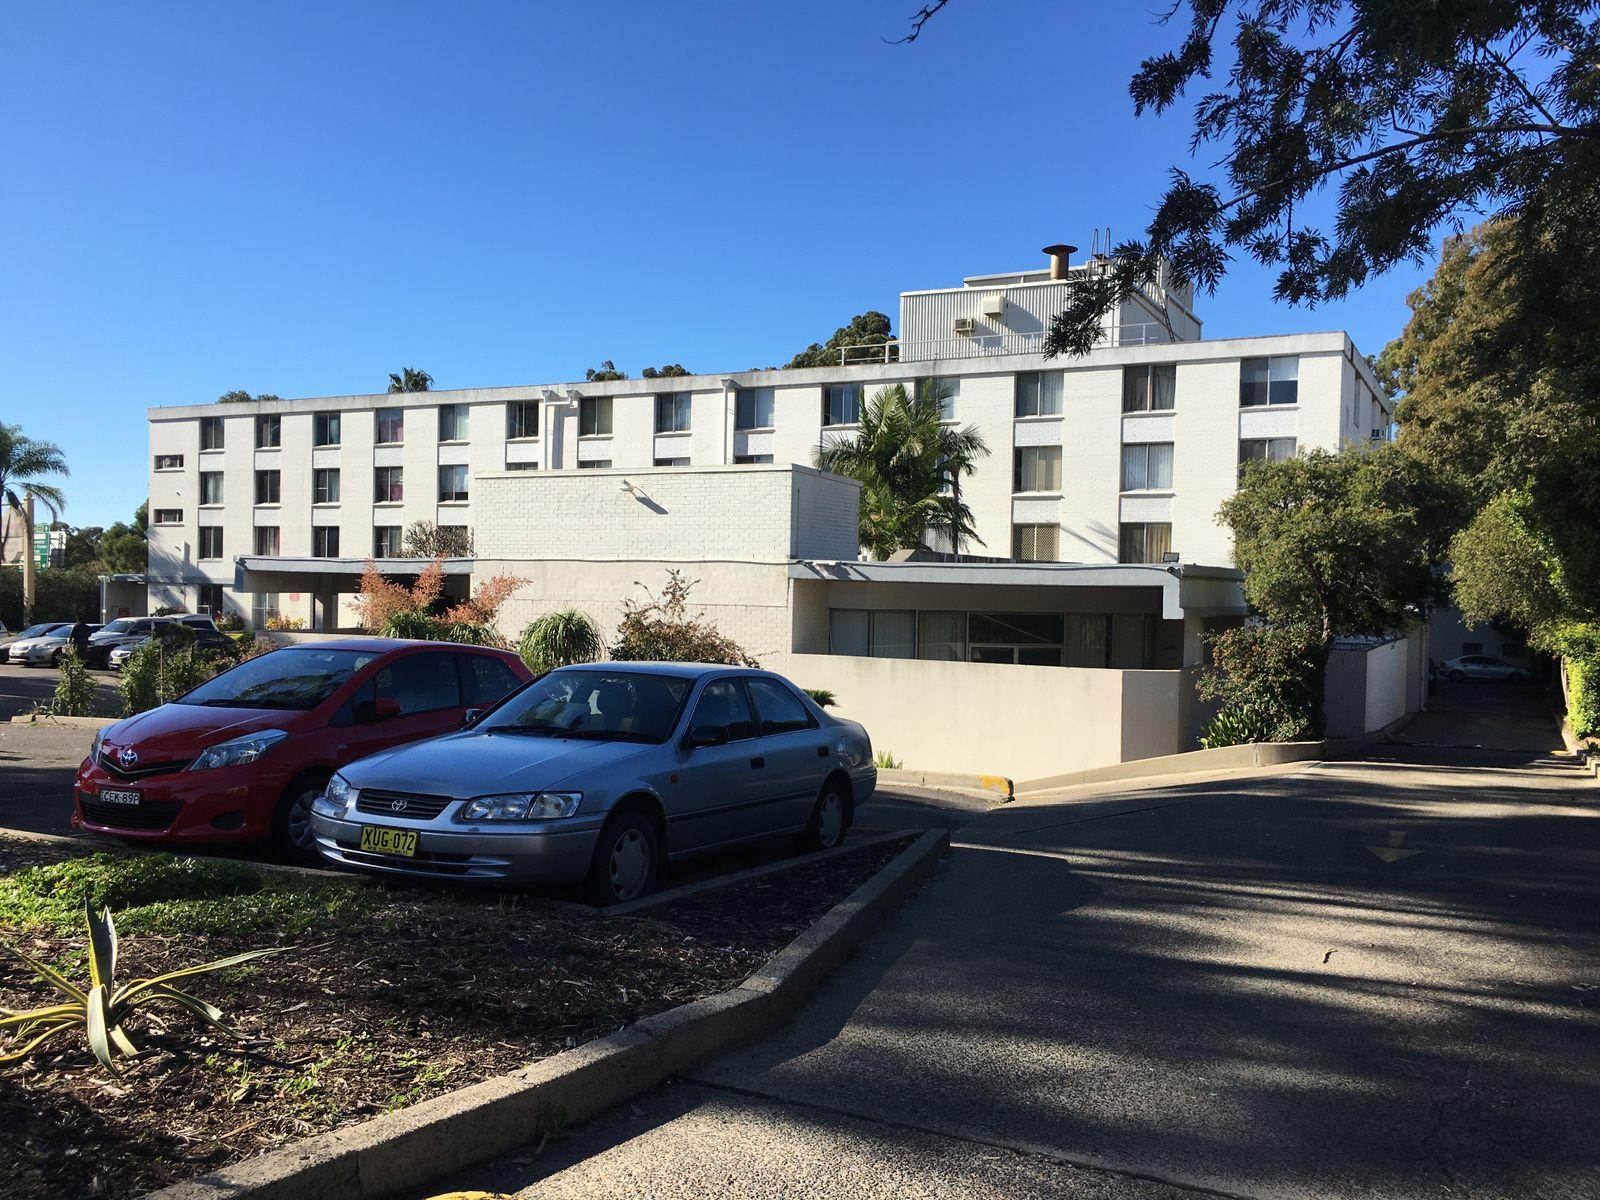 136/95 Station Road, Auburn, NSW 2144